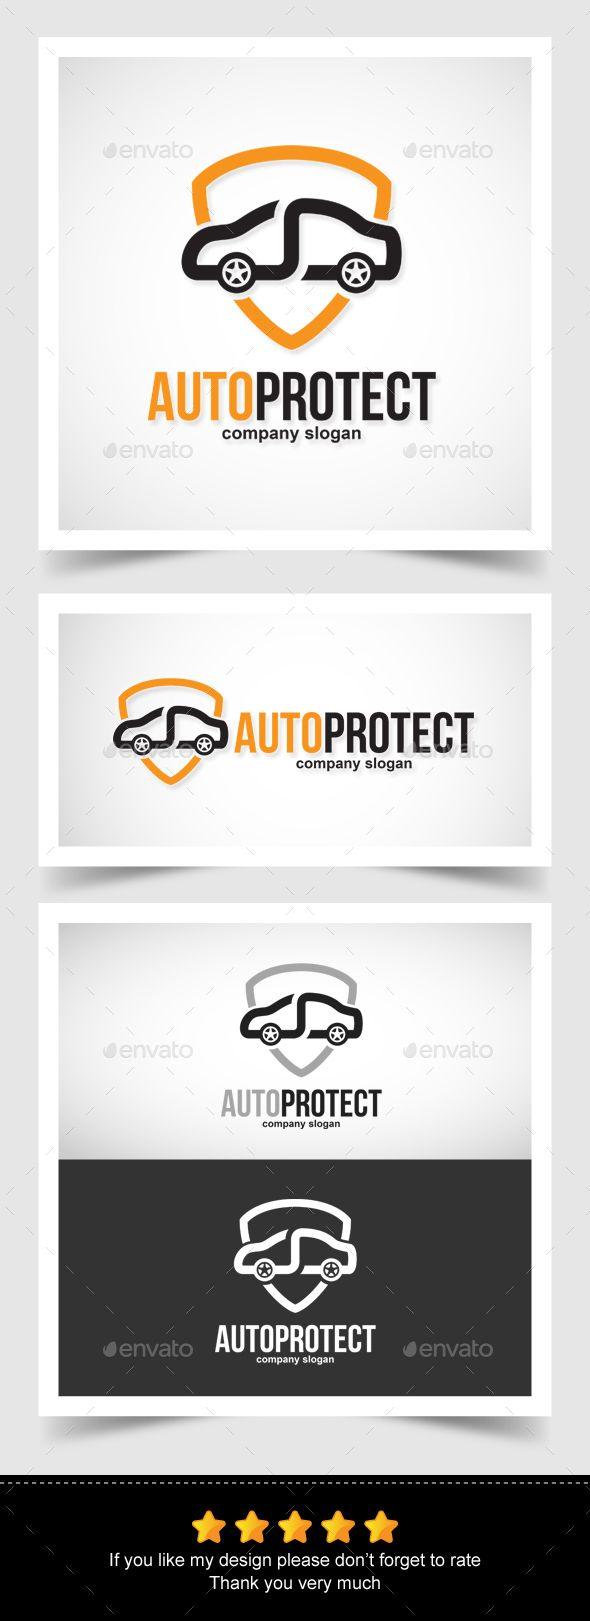 29 best Car Logo images on Pinterest | Logos, Logo templates and Car ...